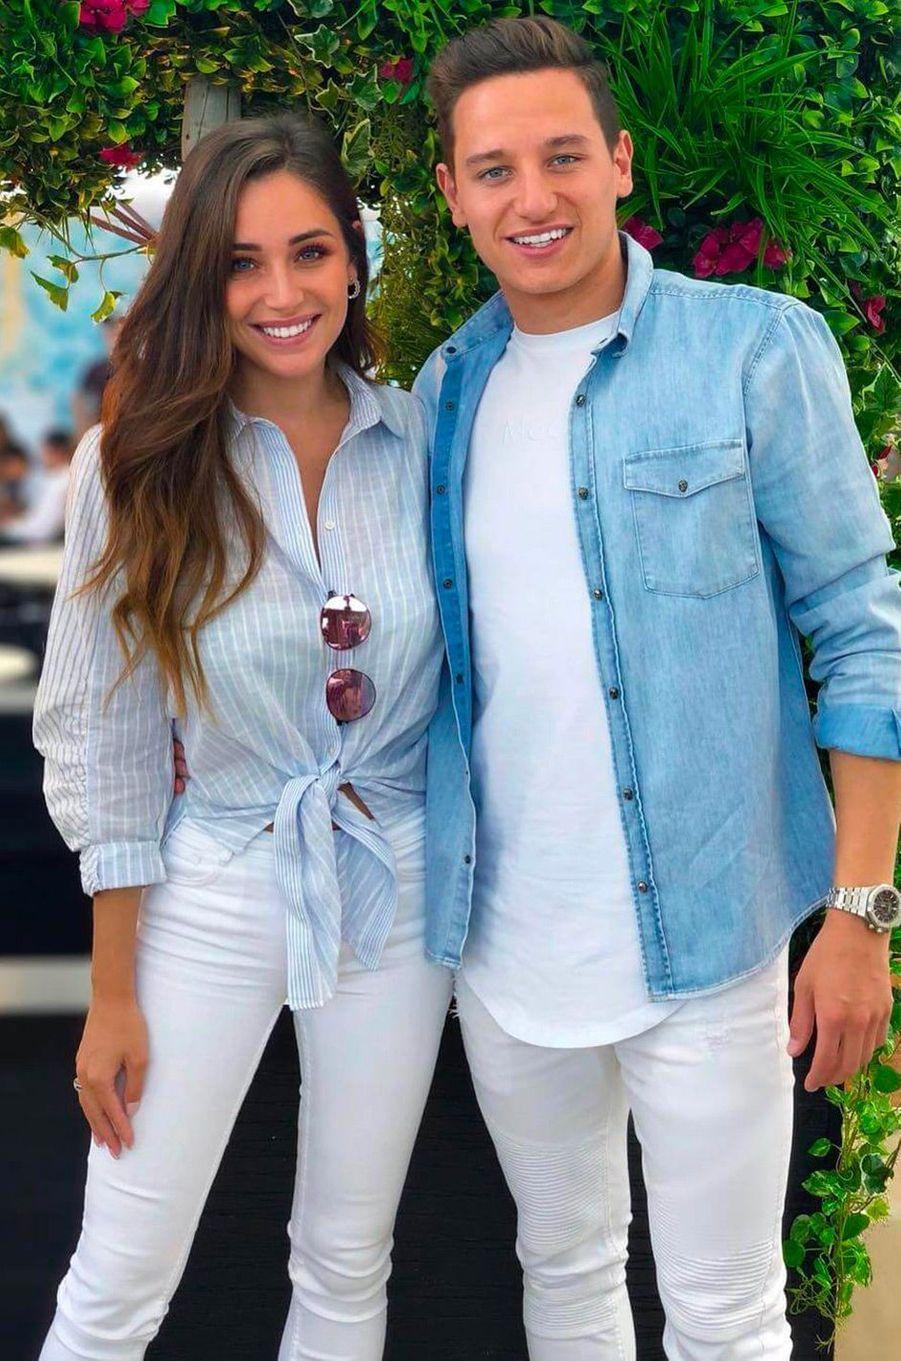 Charlotte Pirroni et Florian Thauvin